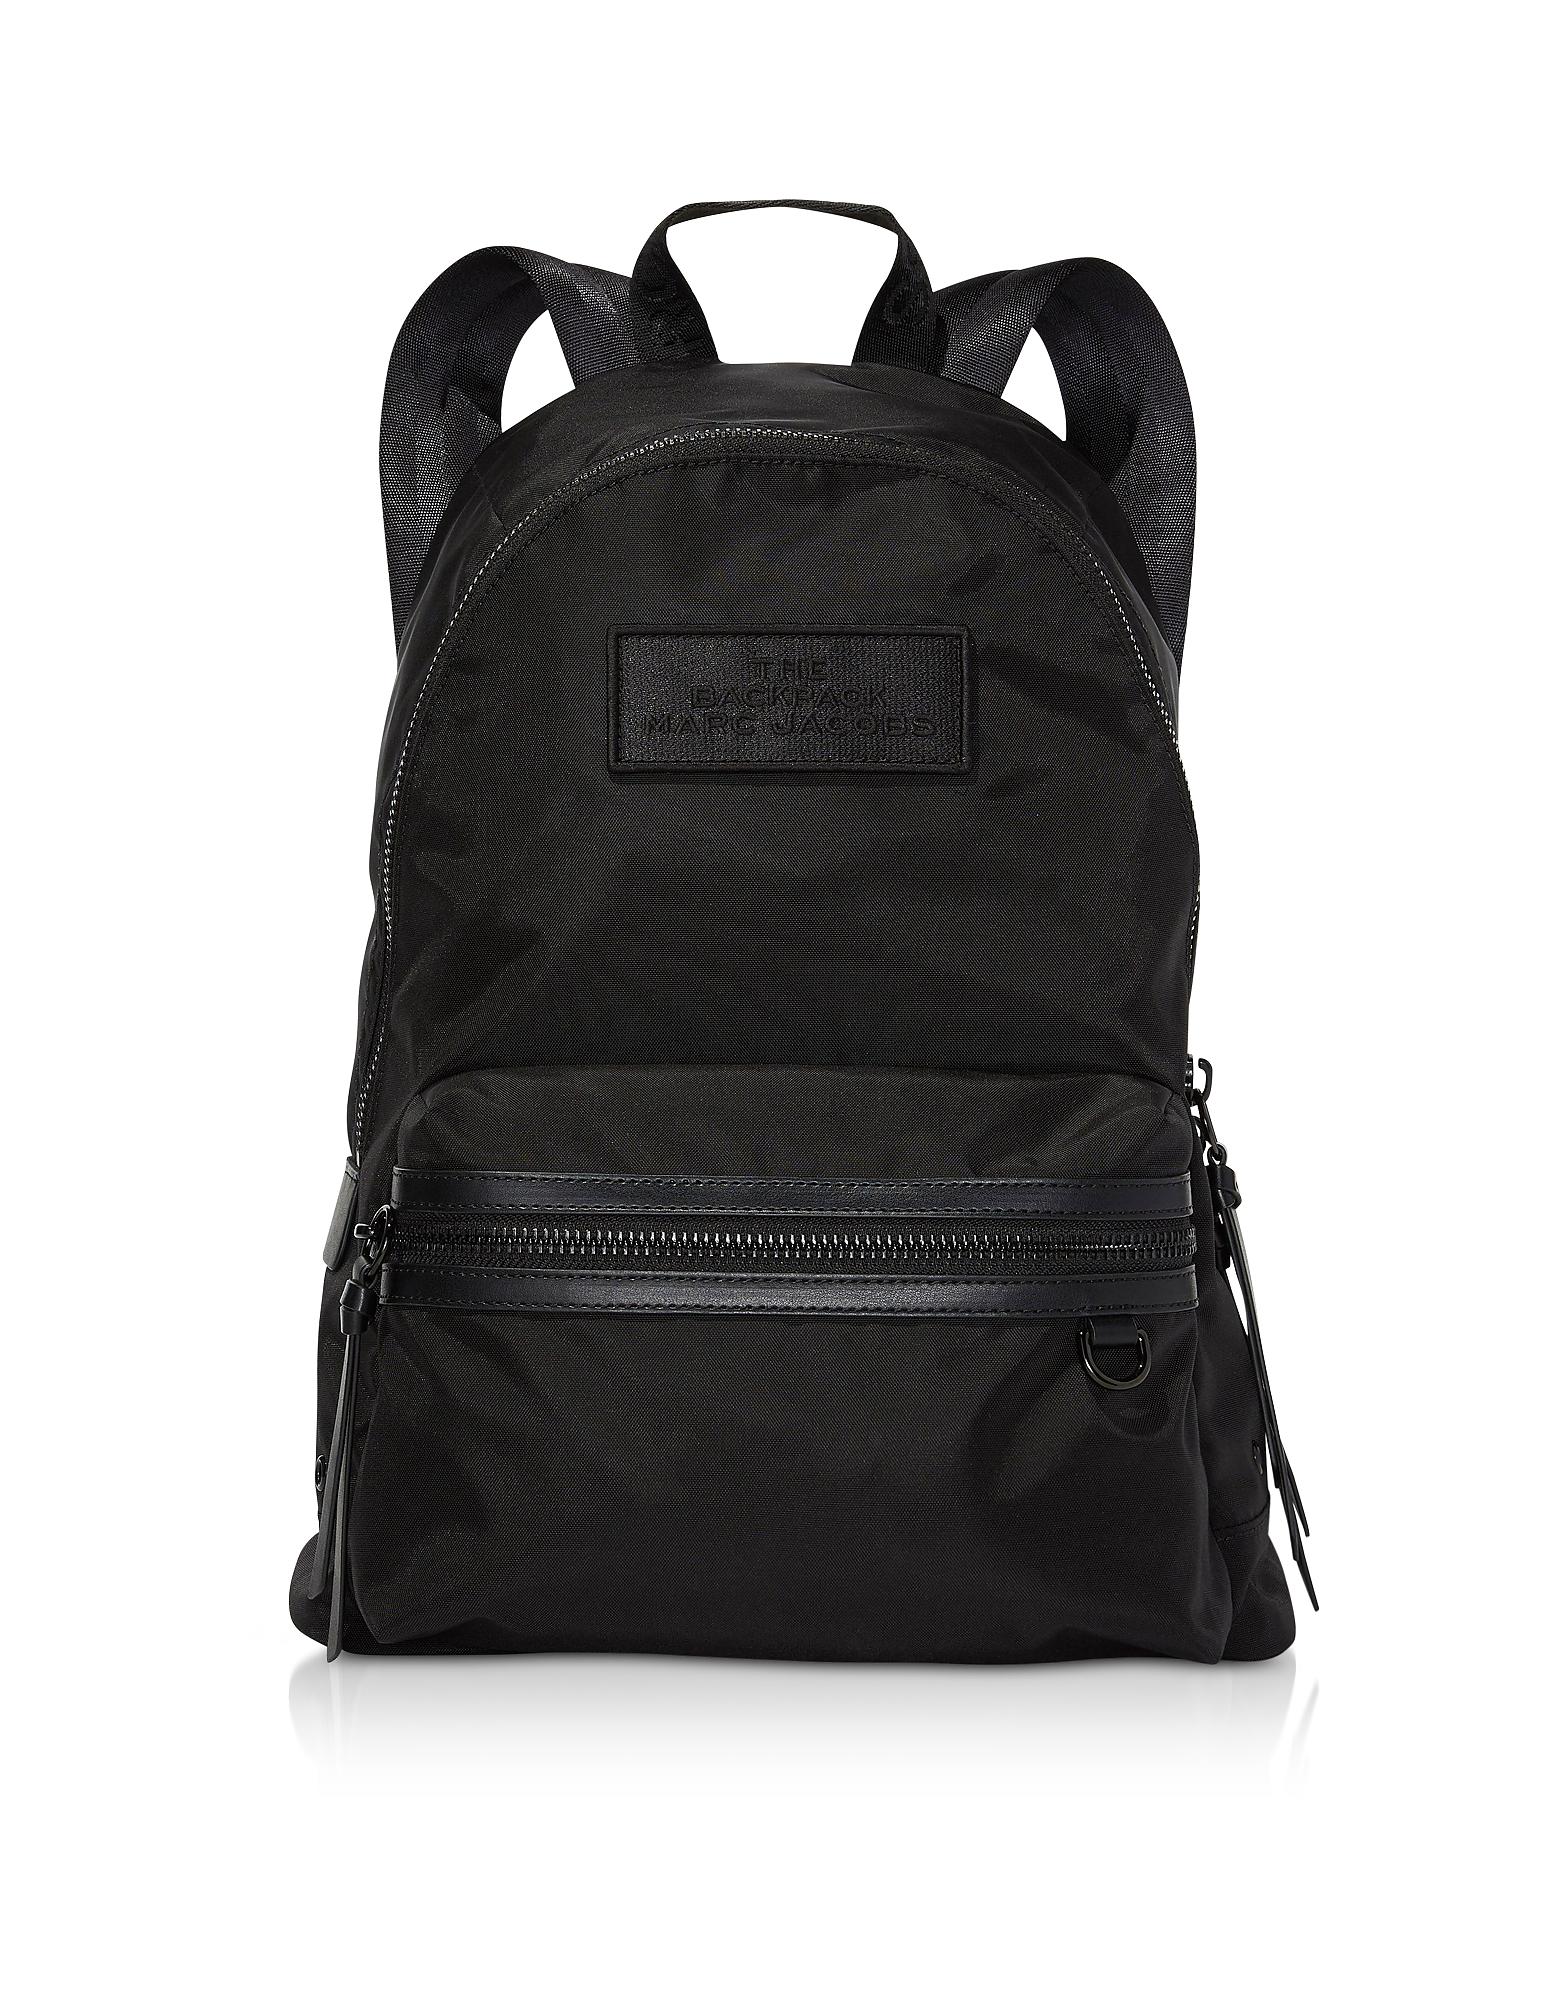 Marc Jacobs Designer Handbags, Black Nylon The Large Backpack DTM